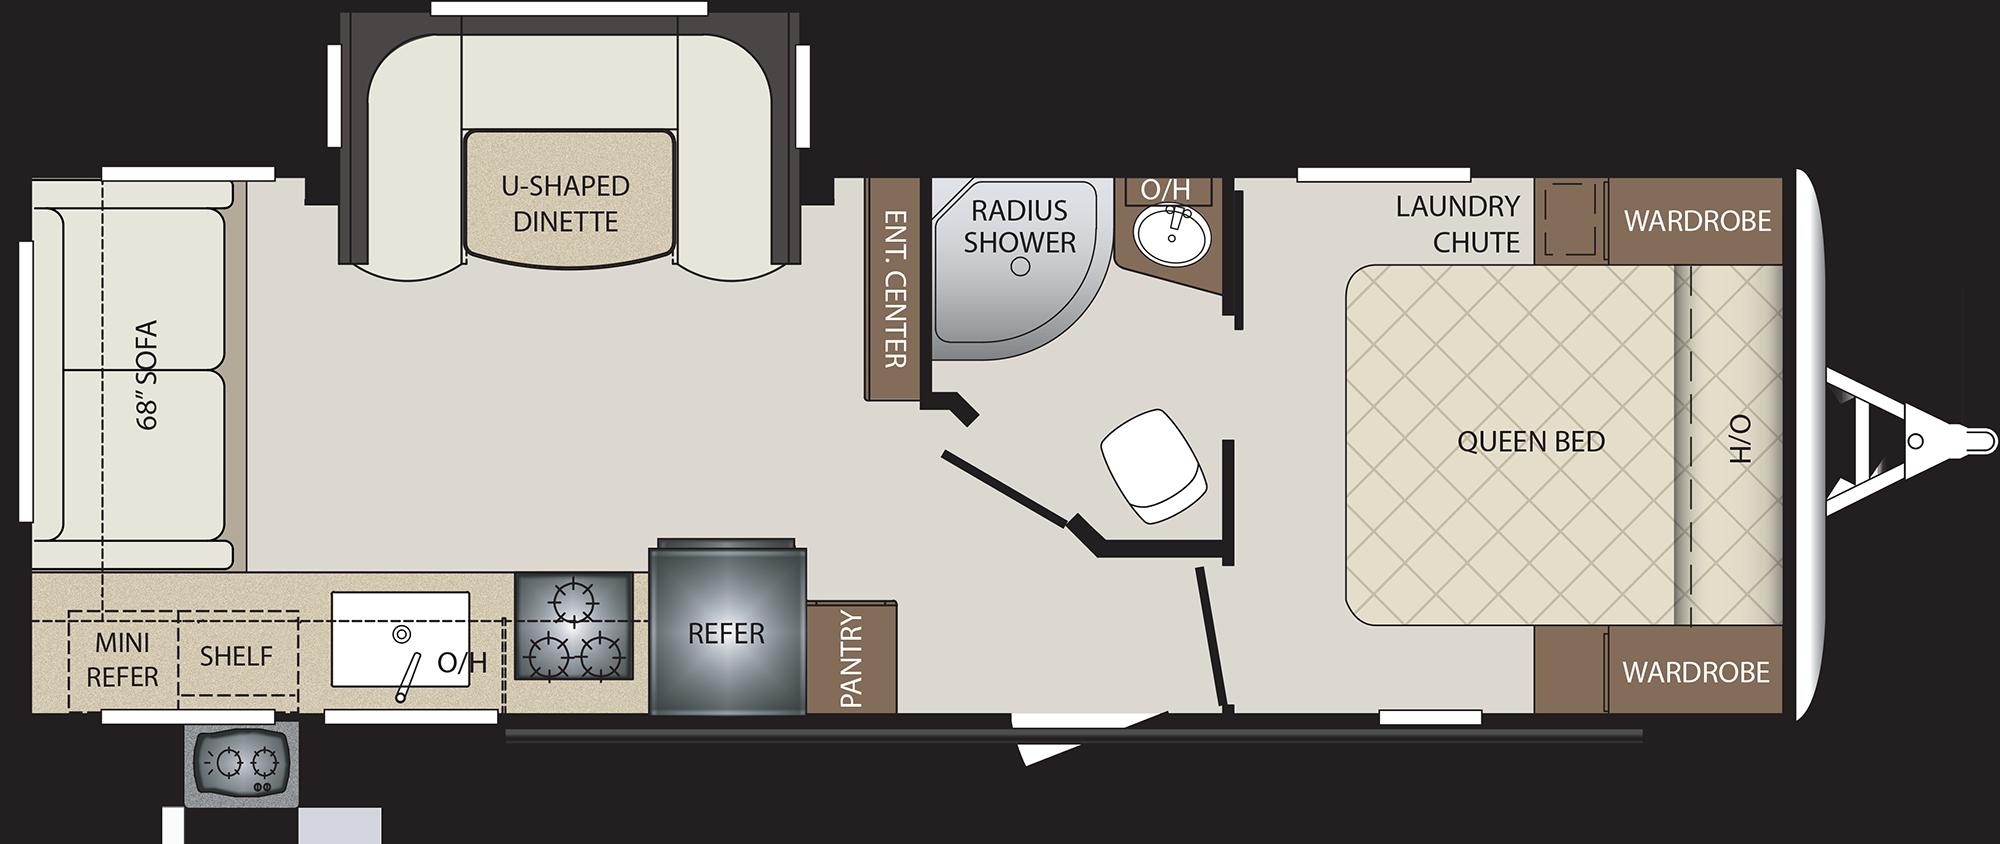 2019 KEYSTONE BULLET 257RSS (couples) Floorplan